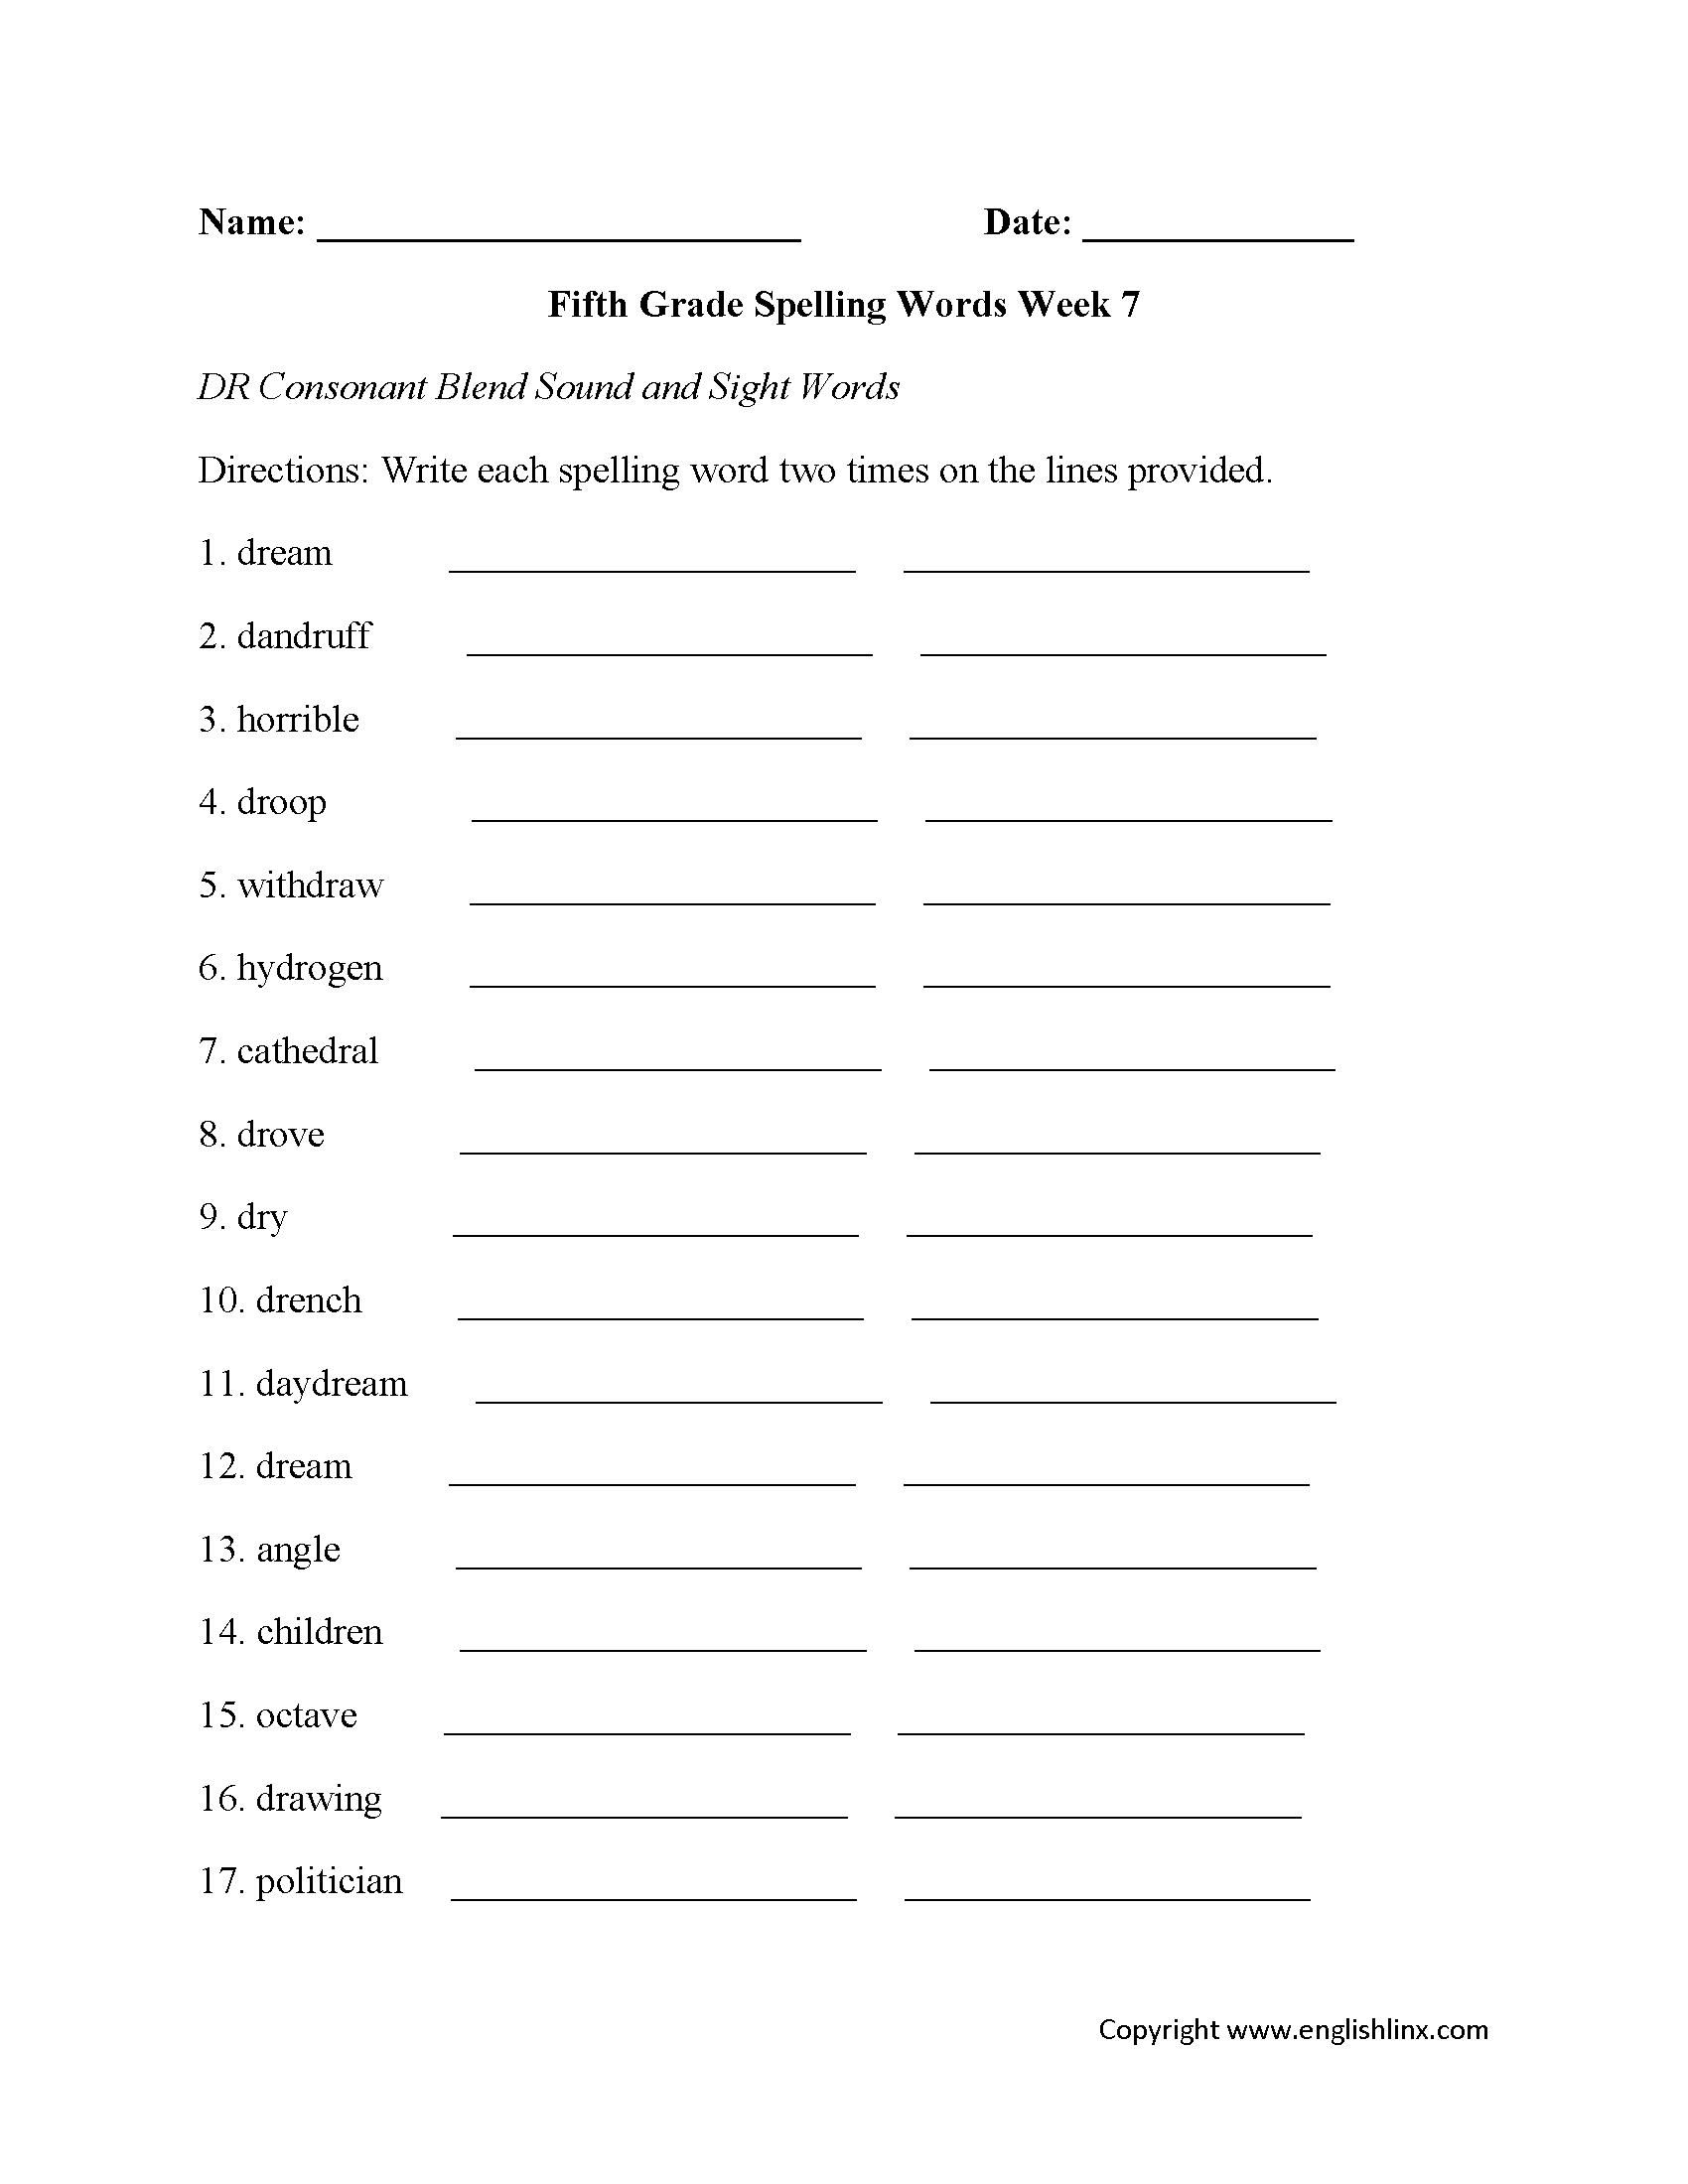 Week 7 Dr Consonant Fifth Grade Spelling Worksheets